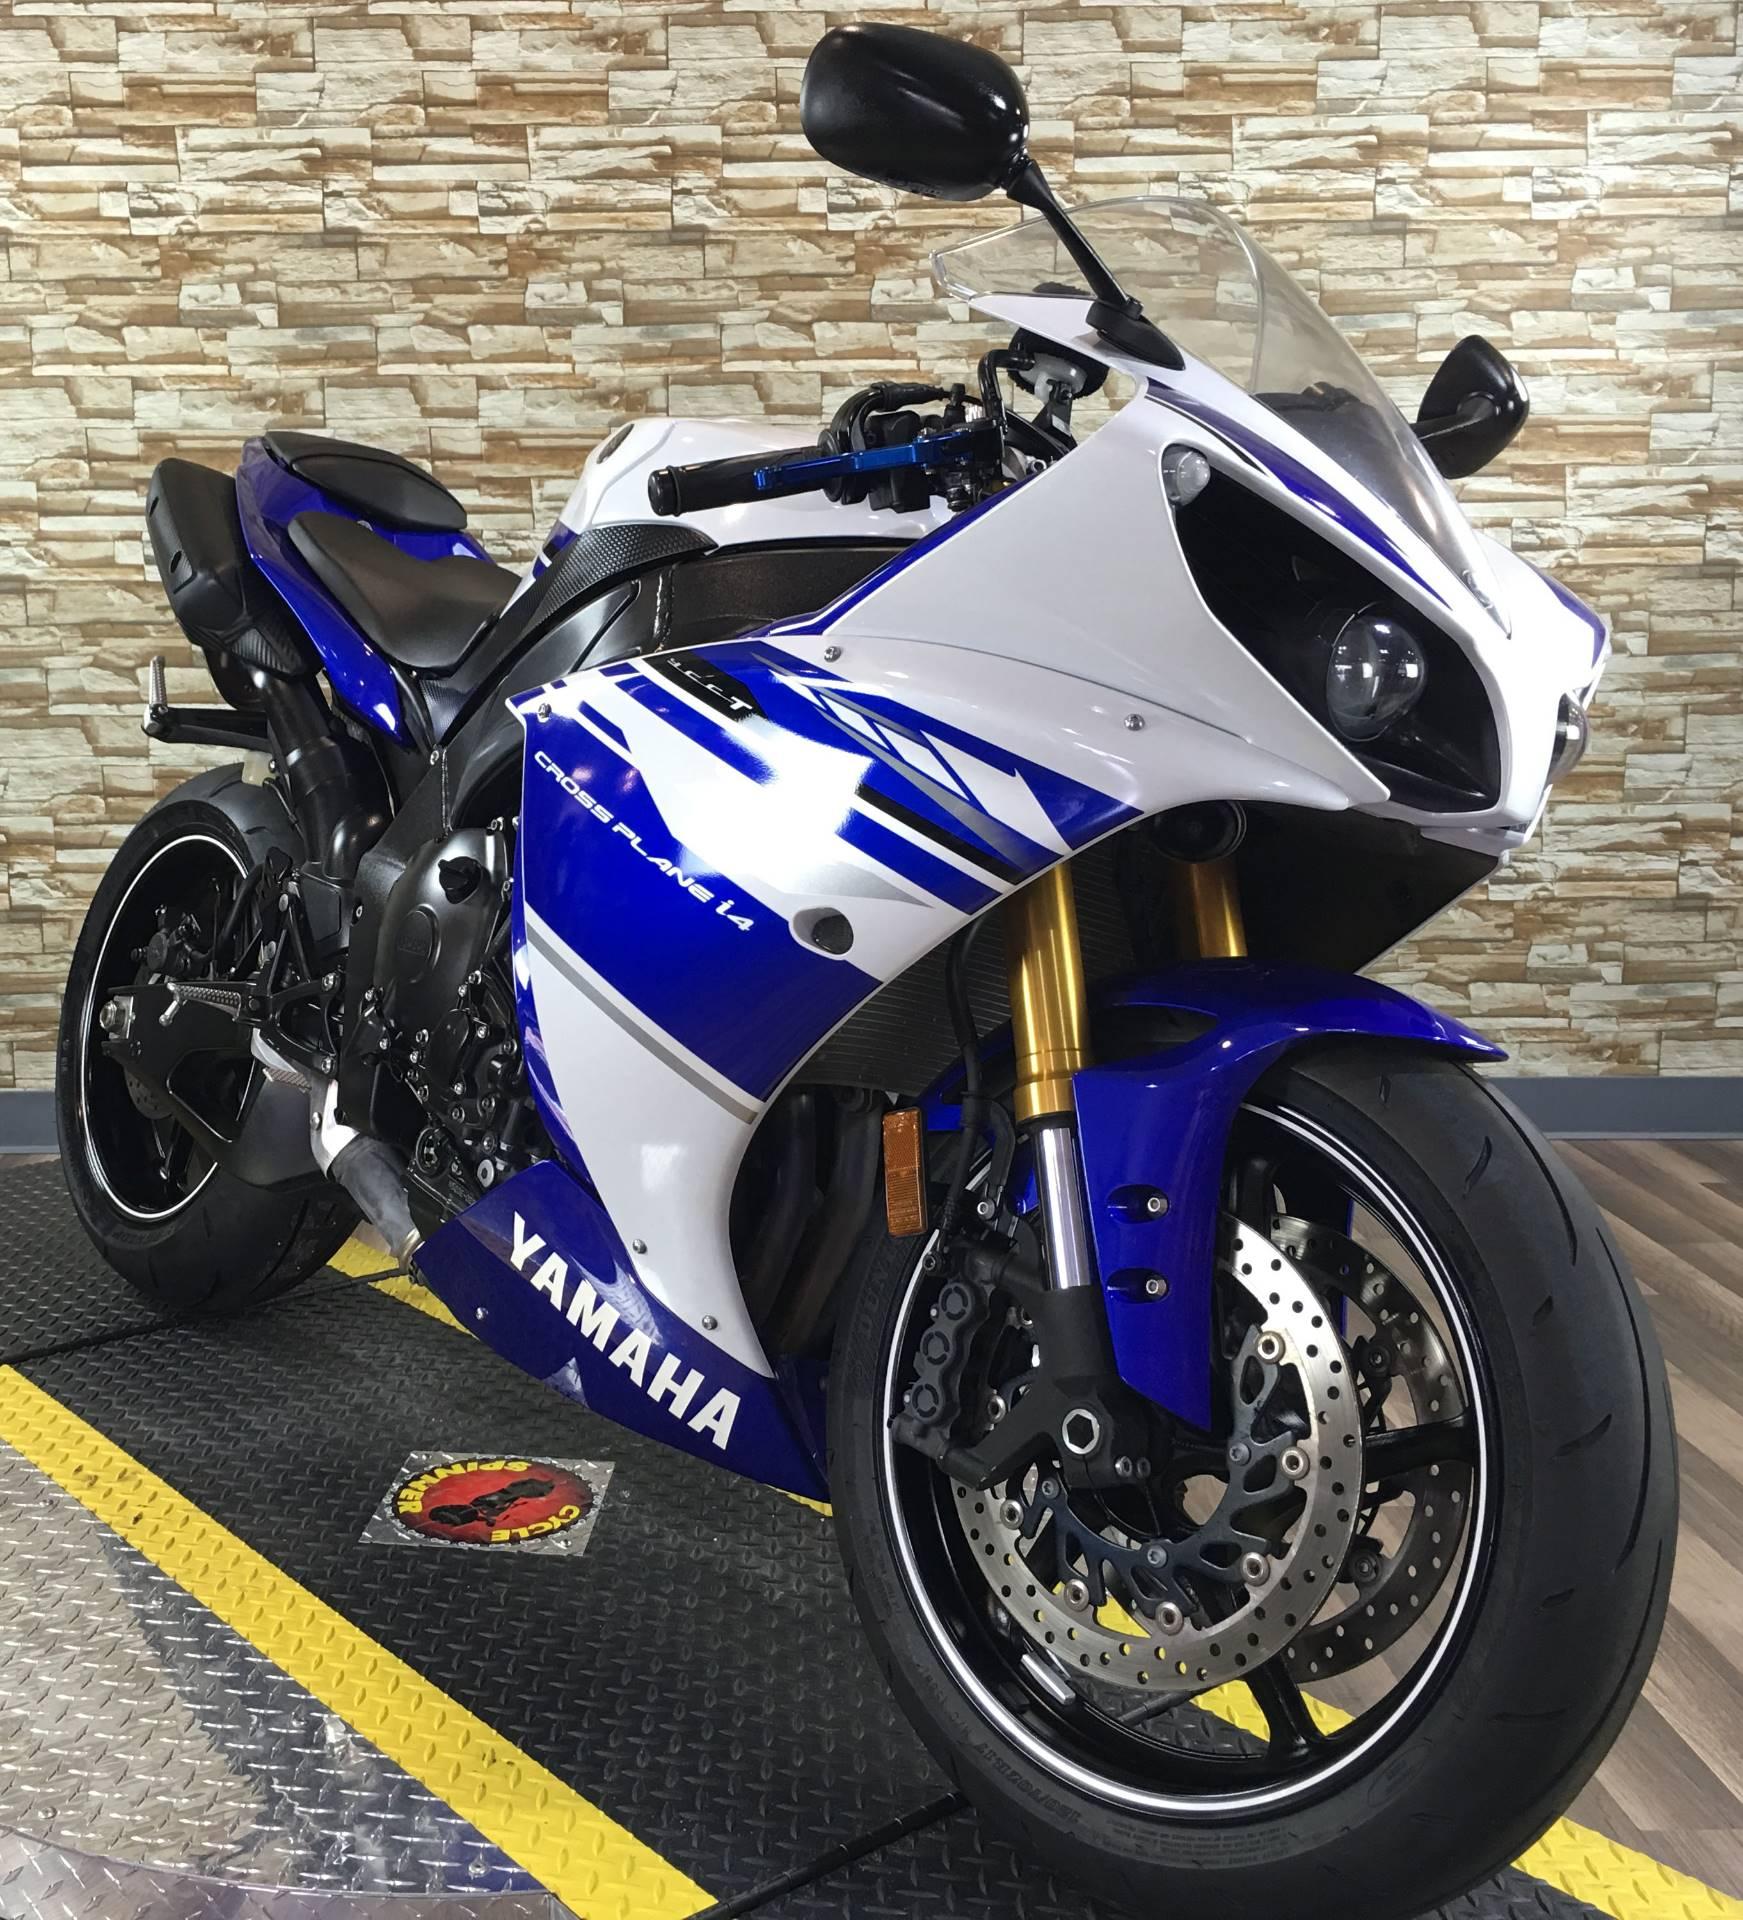 2014 Yamaha YZF-R1 8